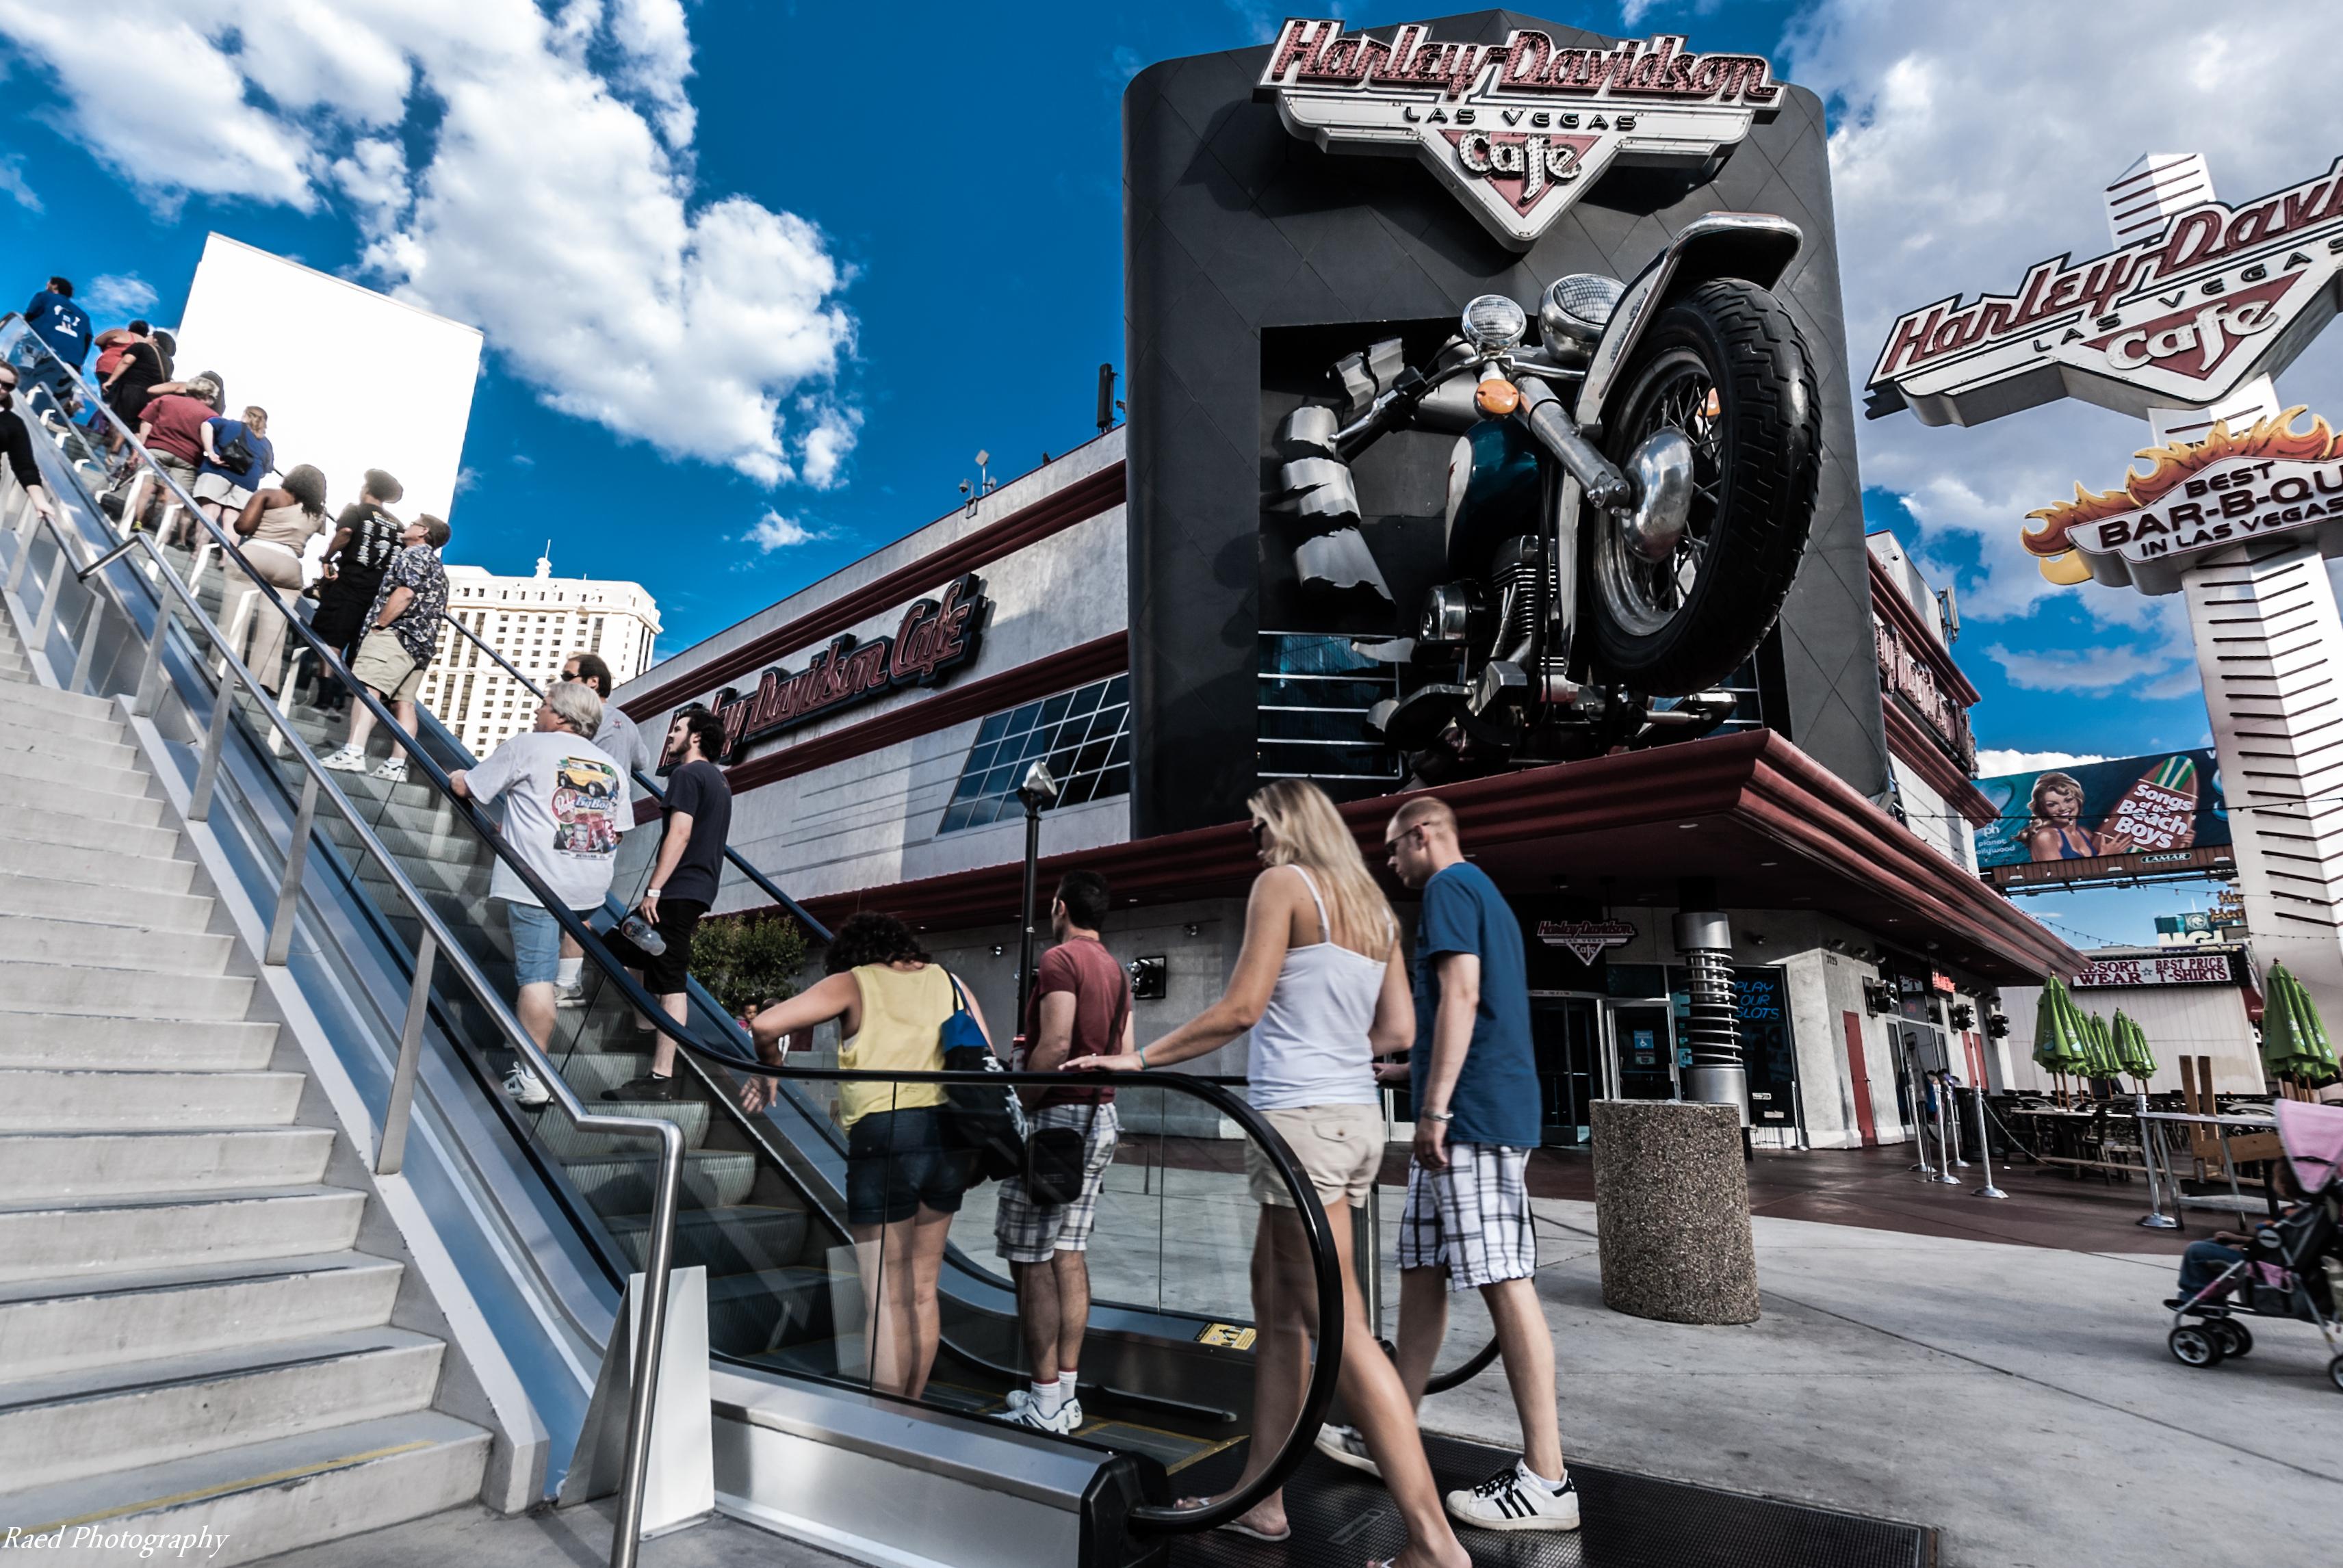 las vegas – harley davidson cafe – street photography | my camera